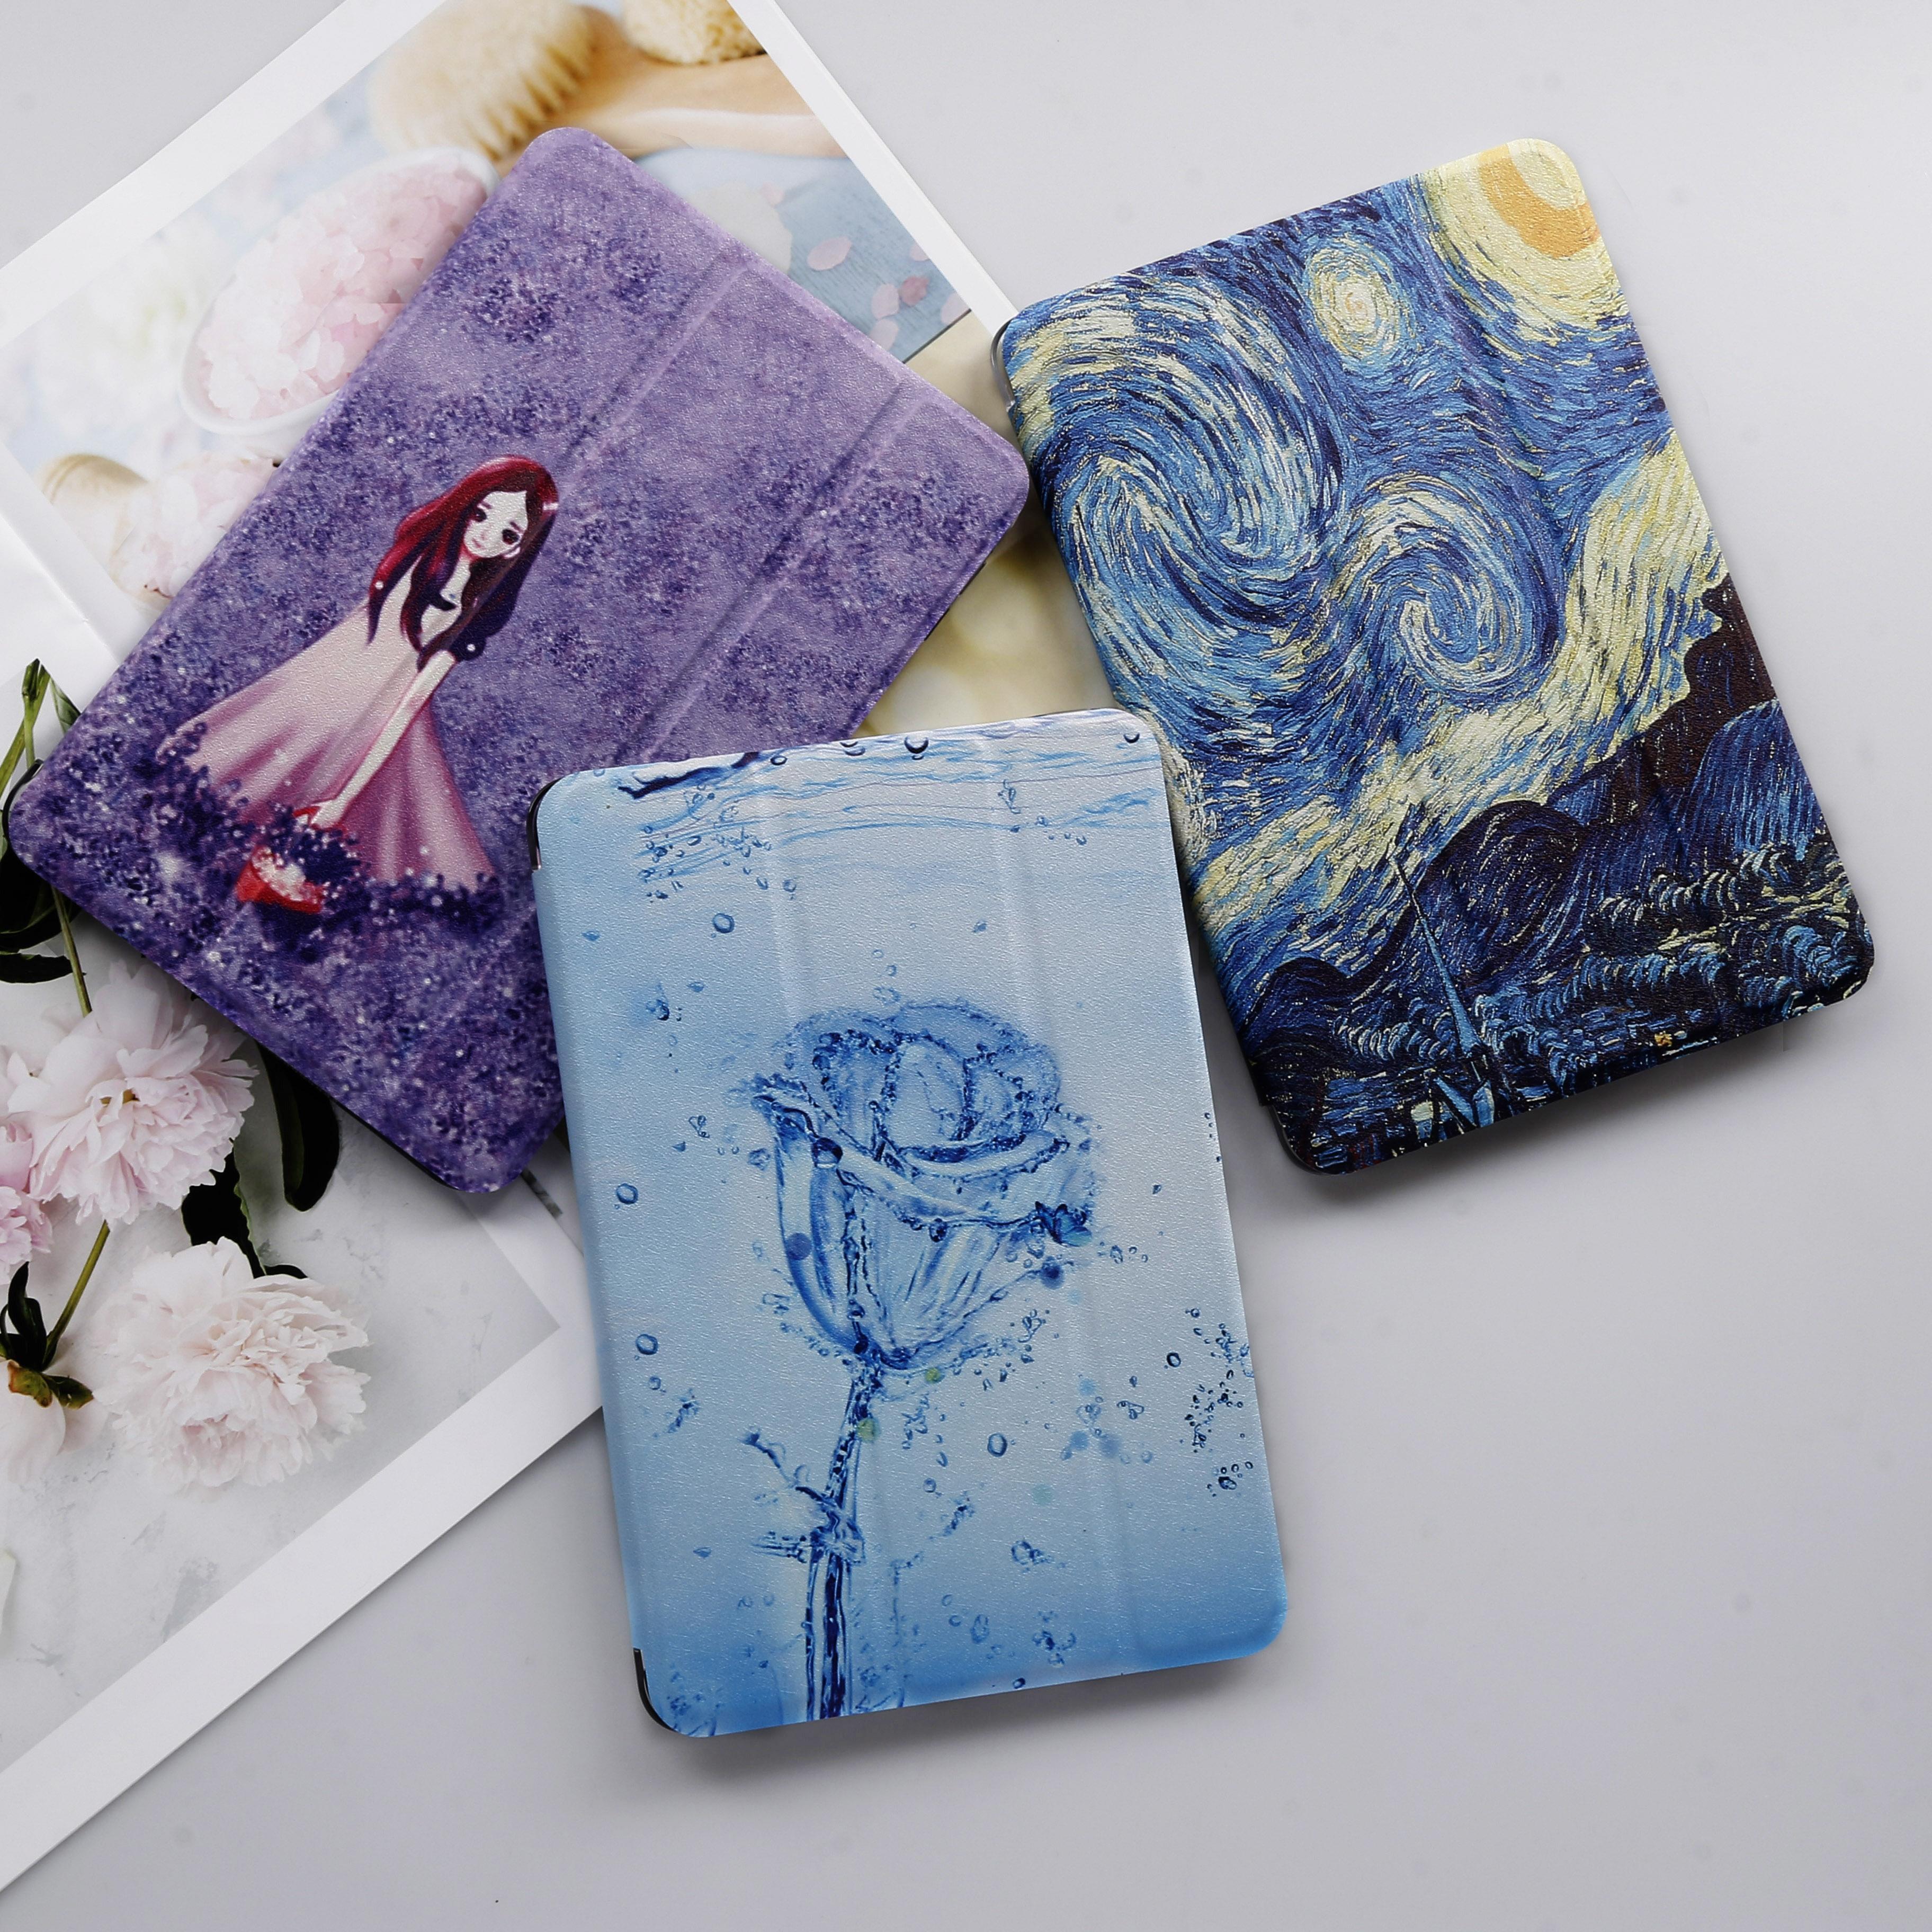 Чехол для планшета Huawei MediaPad T5 10 AGS2-W09/L09/L03 10,1 ''fundas Ultra wake Smart Cover для M5 Lite 10 BAH2-L09/W19 10,1 дюймов-5